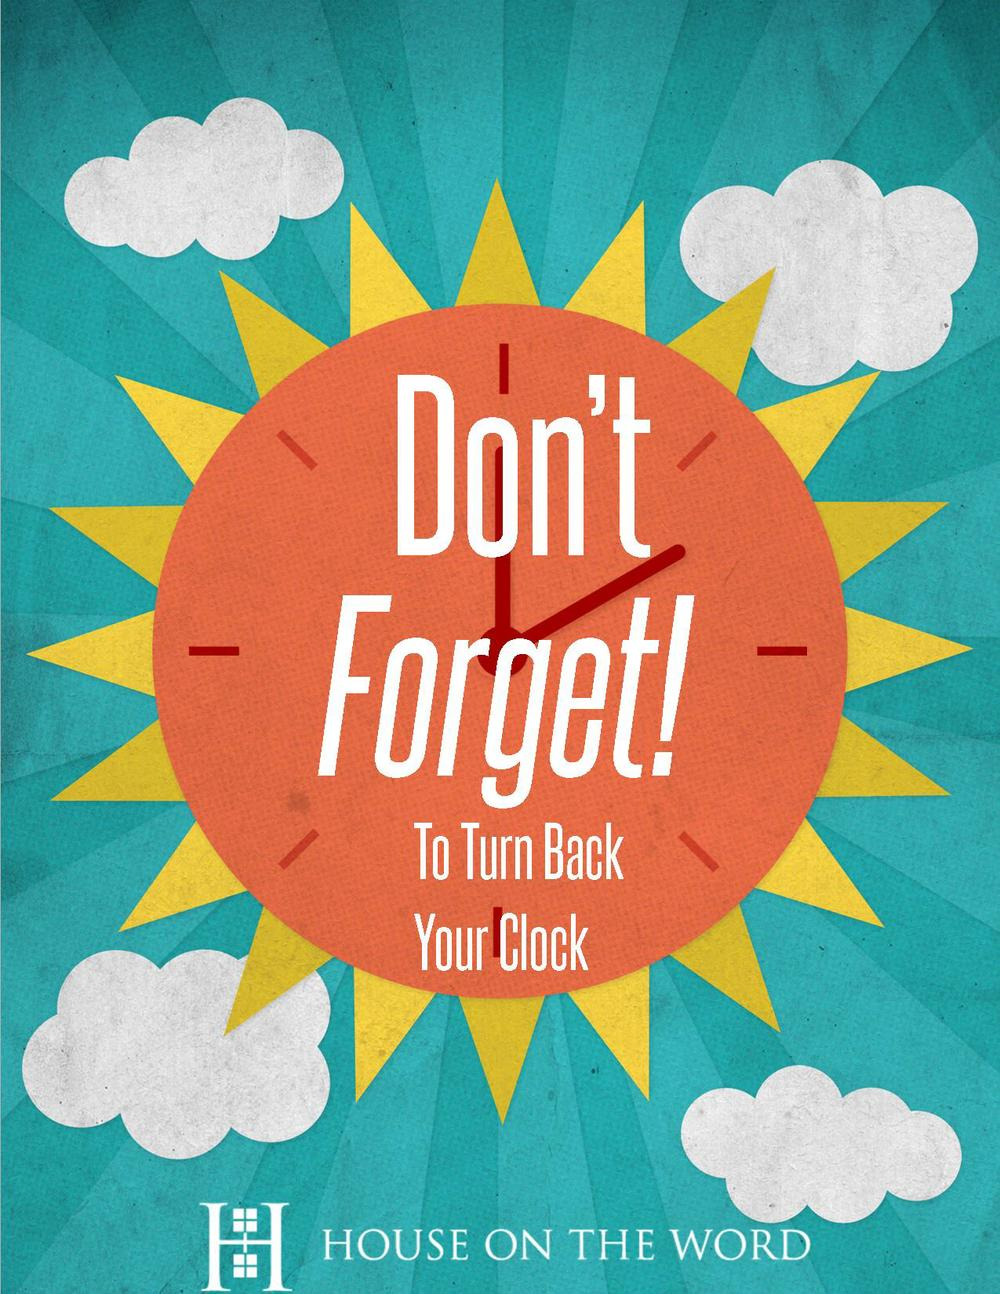 Daylight Savings Time Church Flyer.jpg